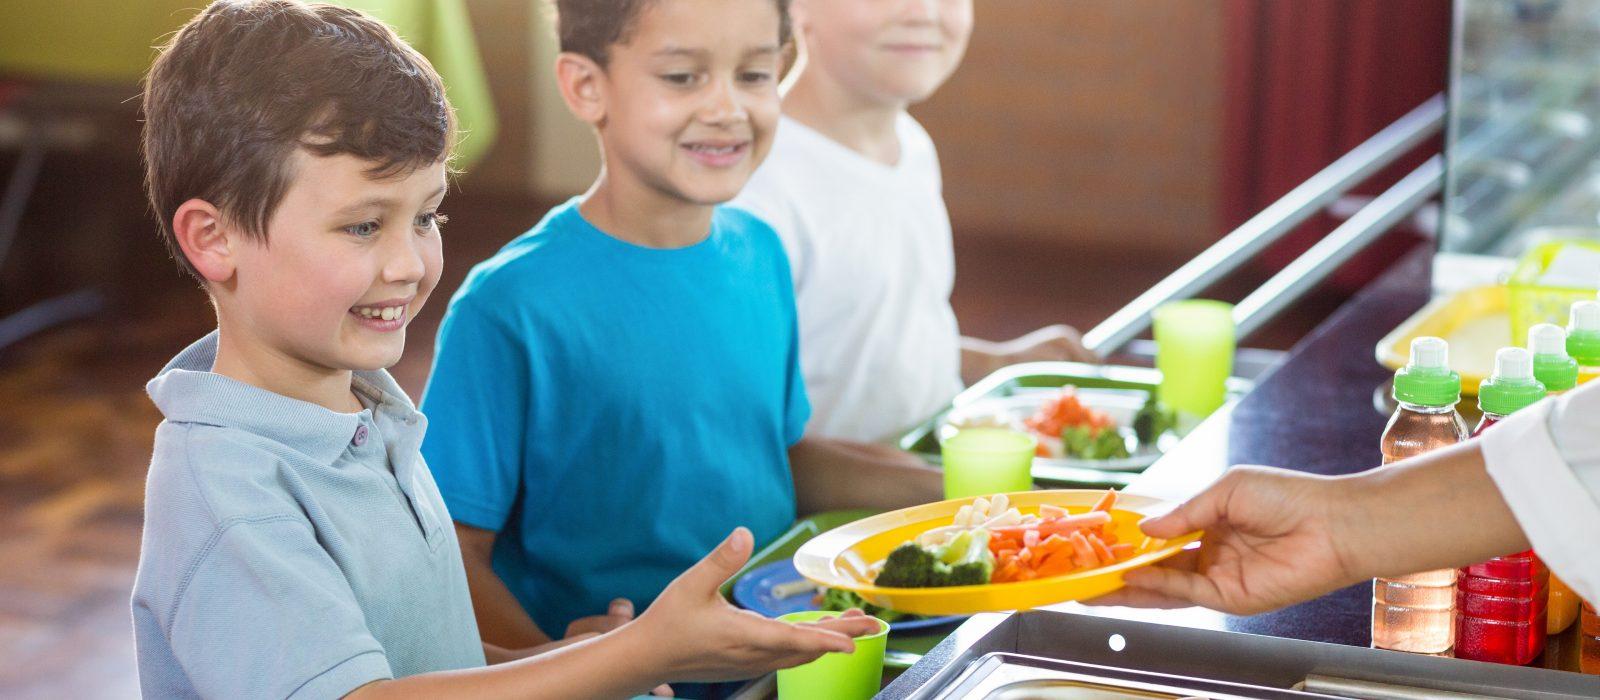 Image of children receiving a healthy school lunch